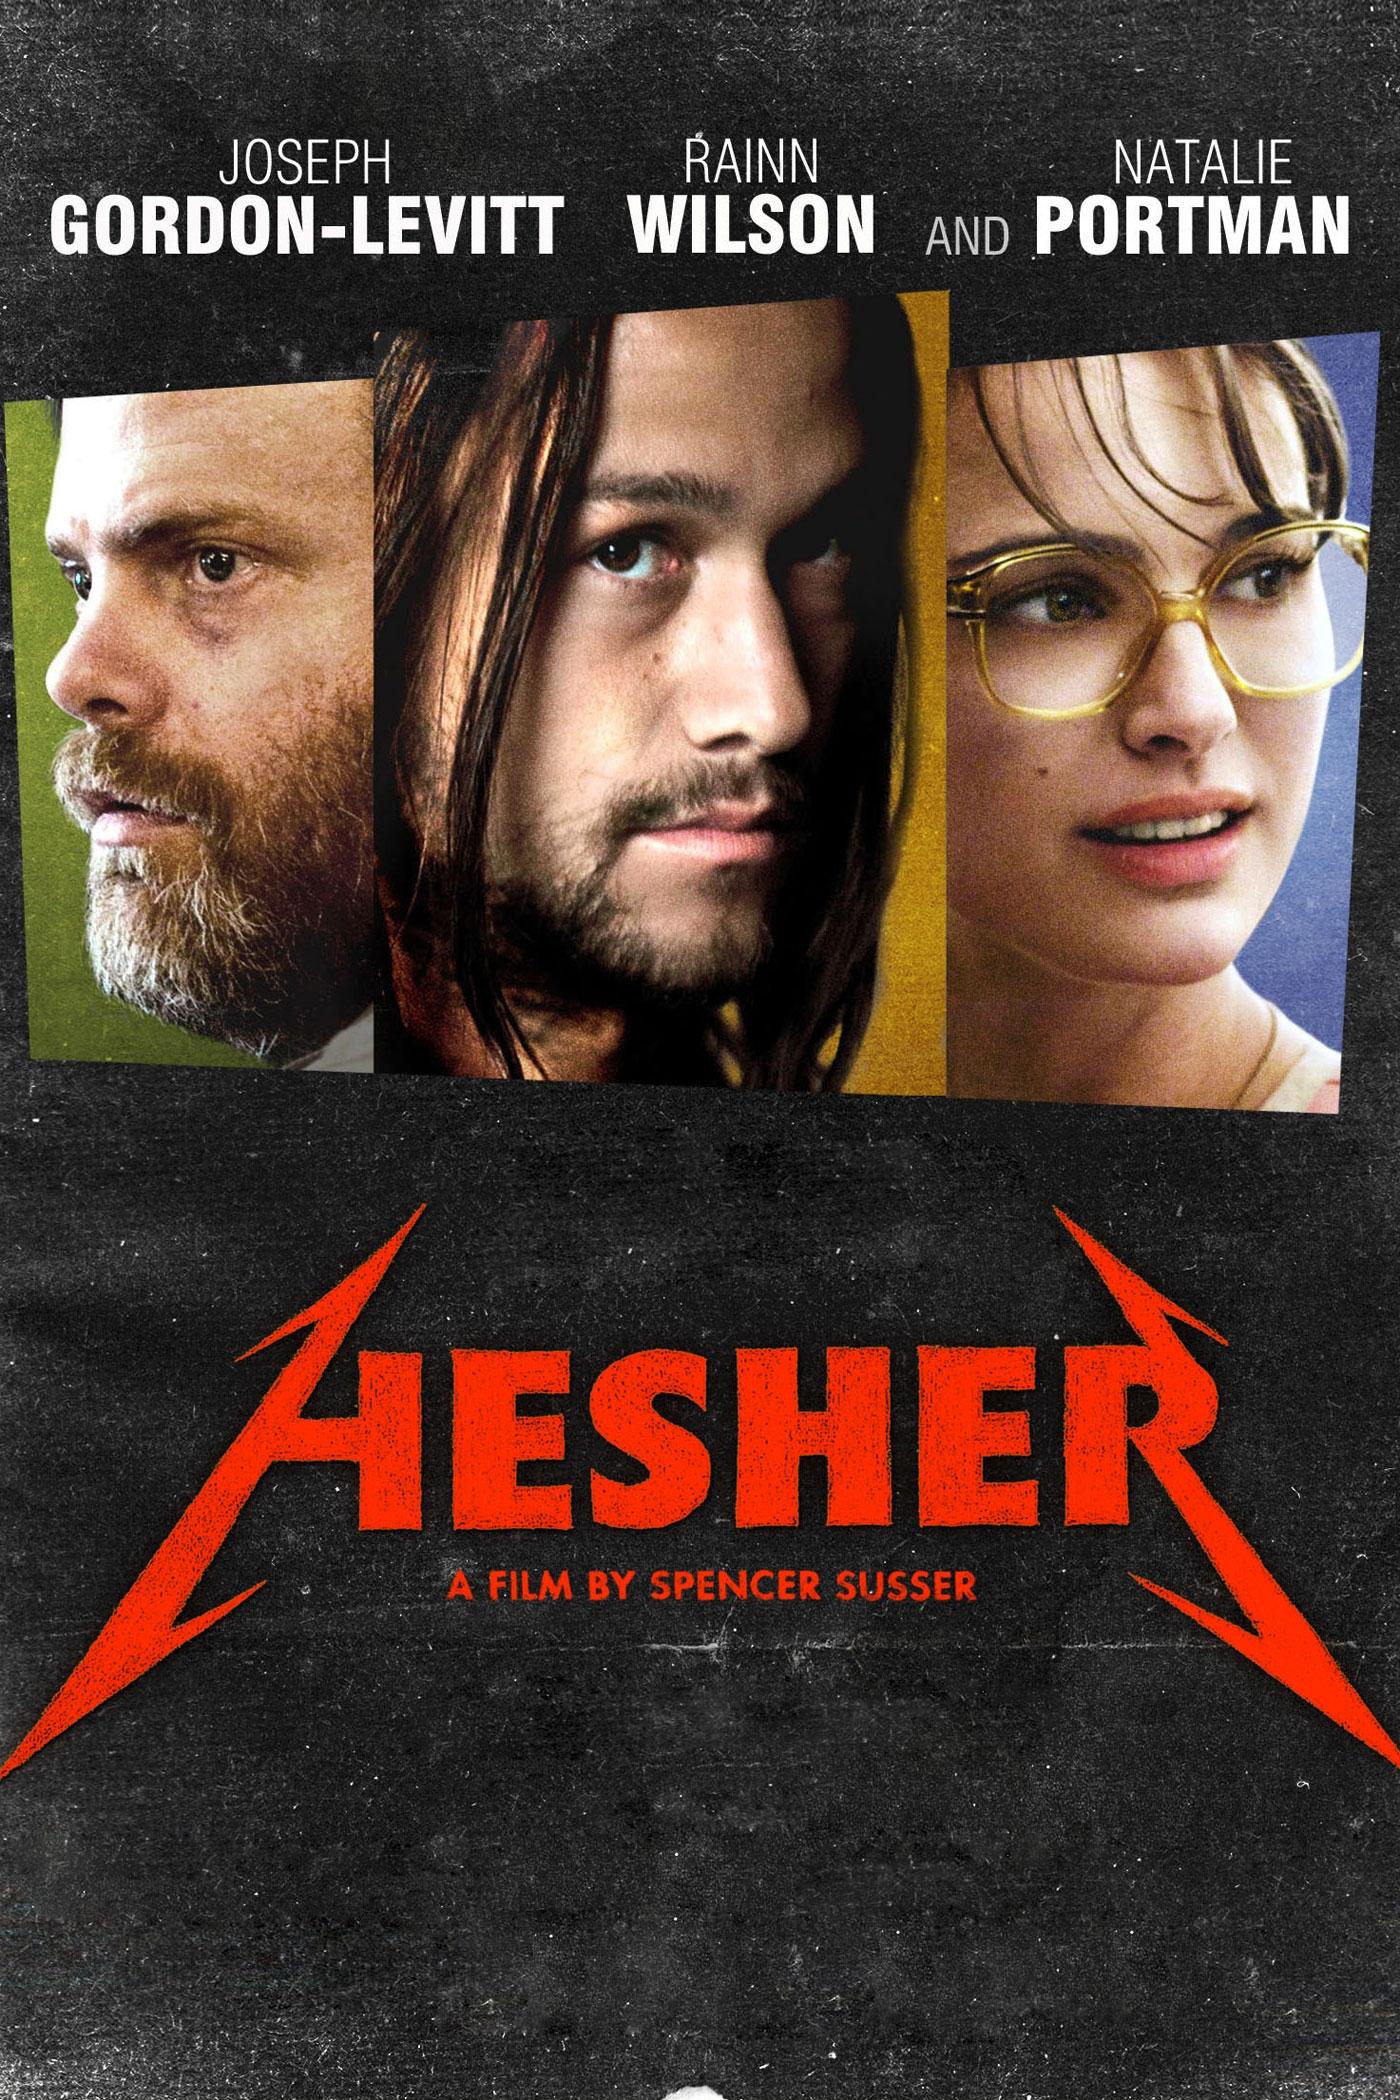 Hesher Film